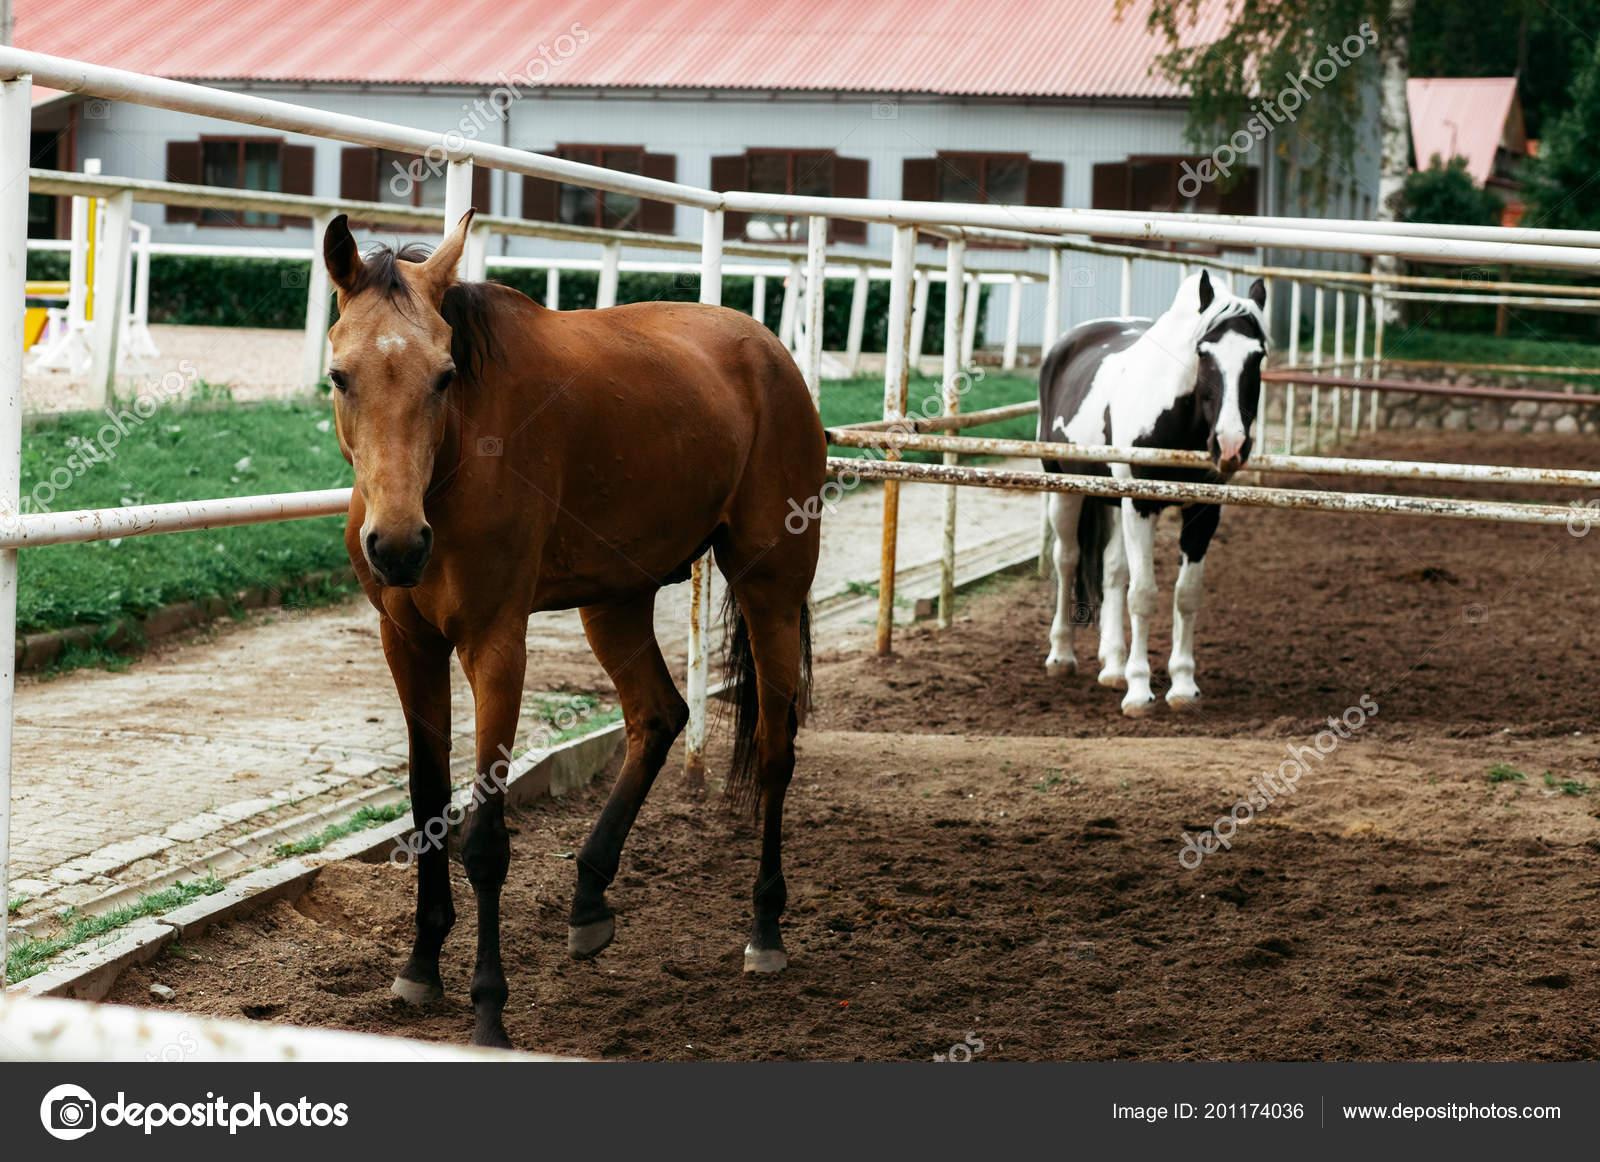 Beautiful Horses Animals Pasture Stables Horseback Riding Stock Photo C Vitizh 201174036